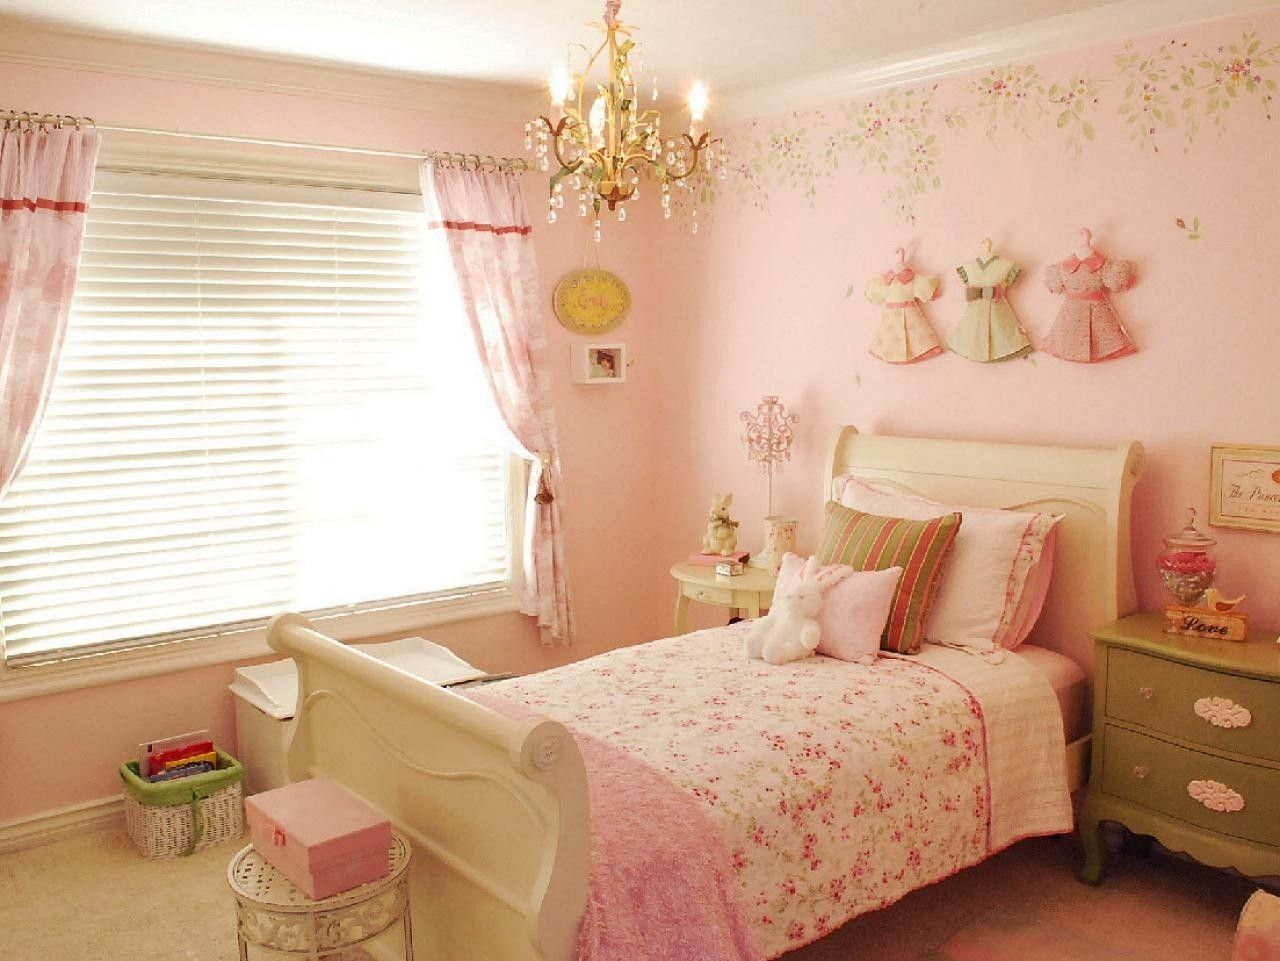 Girly vintage zimmer dekor pin by zane kelley on shabby chic  pinterest  room girls bedroom